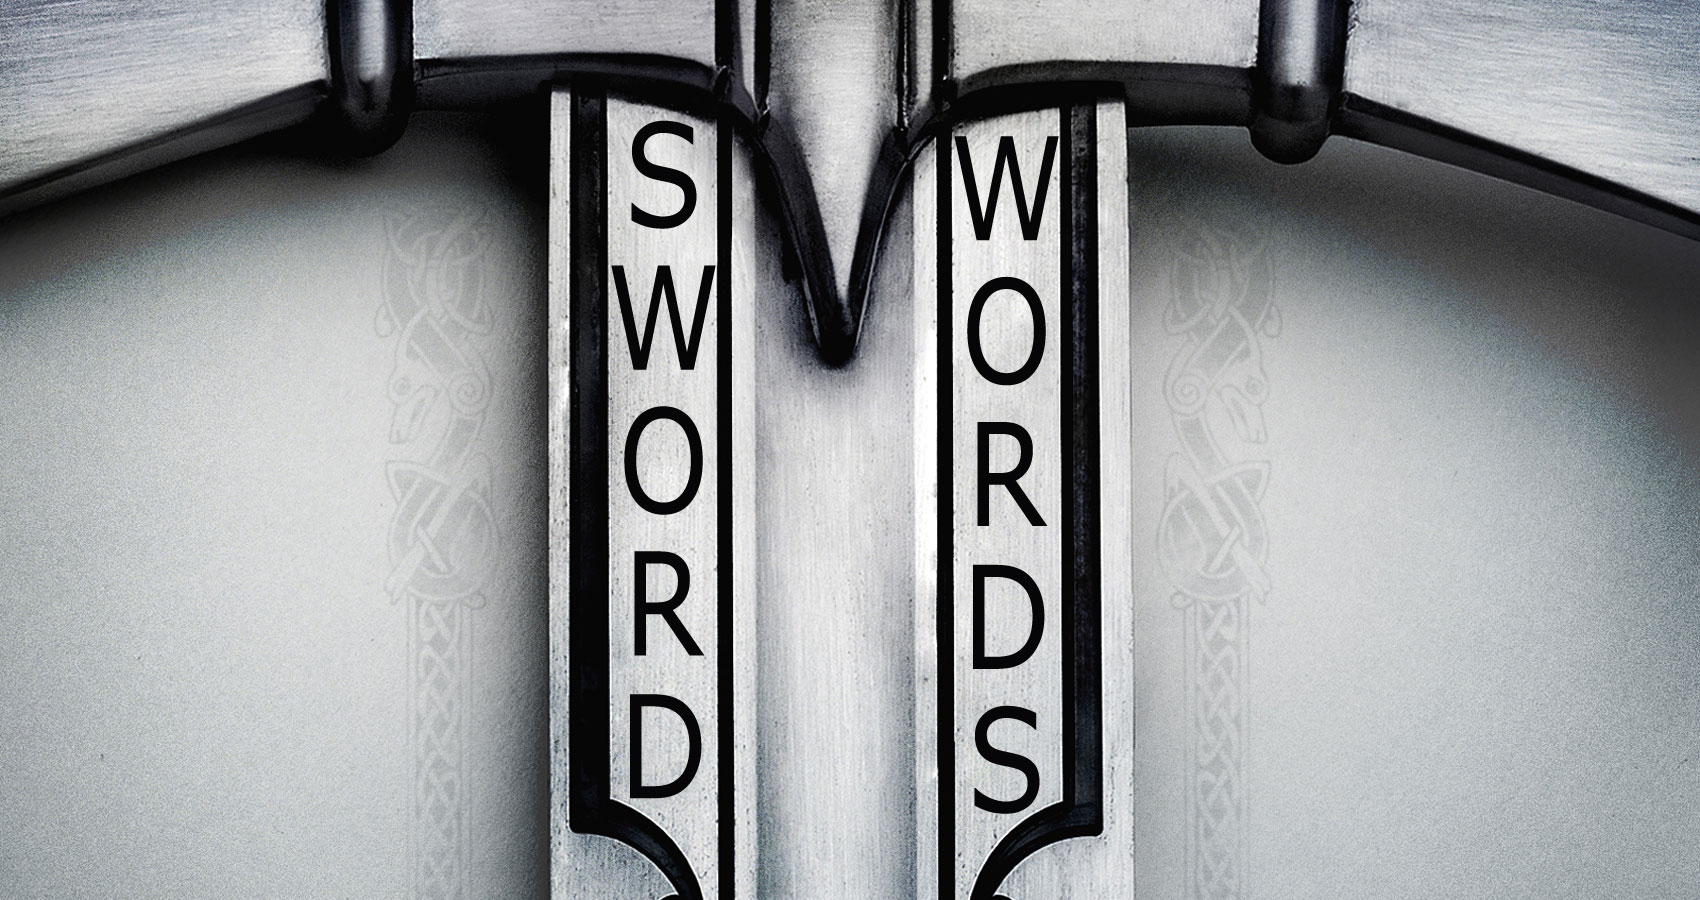 Sword Words written by Regis Auffrayat Spillwords.com